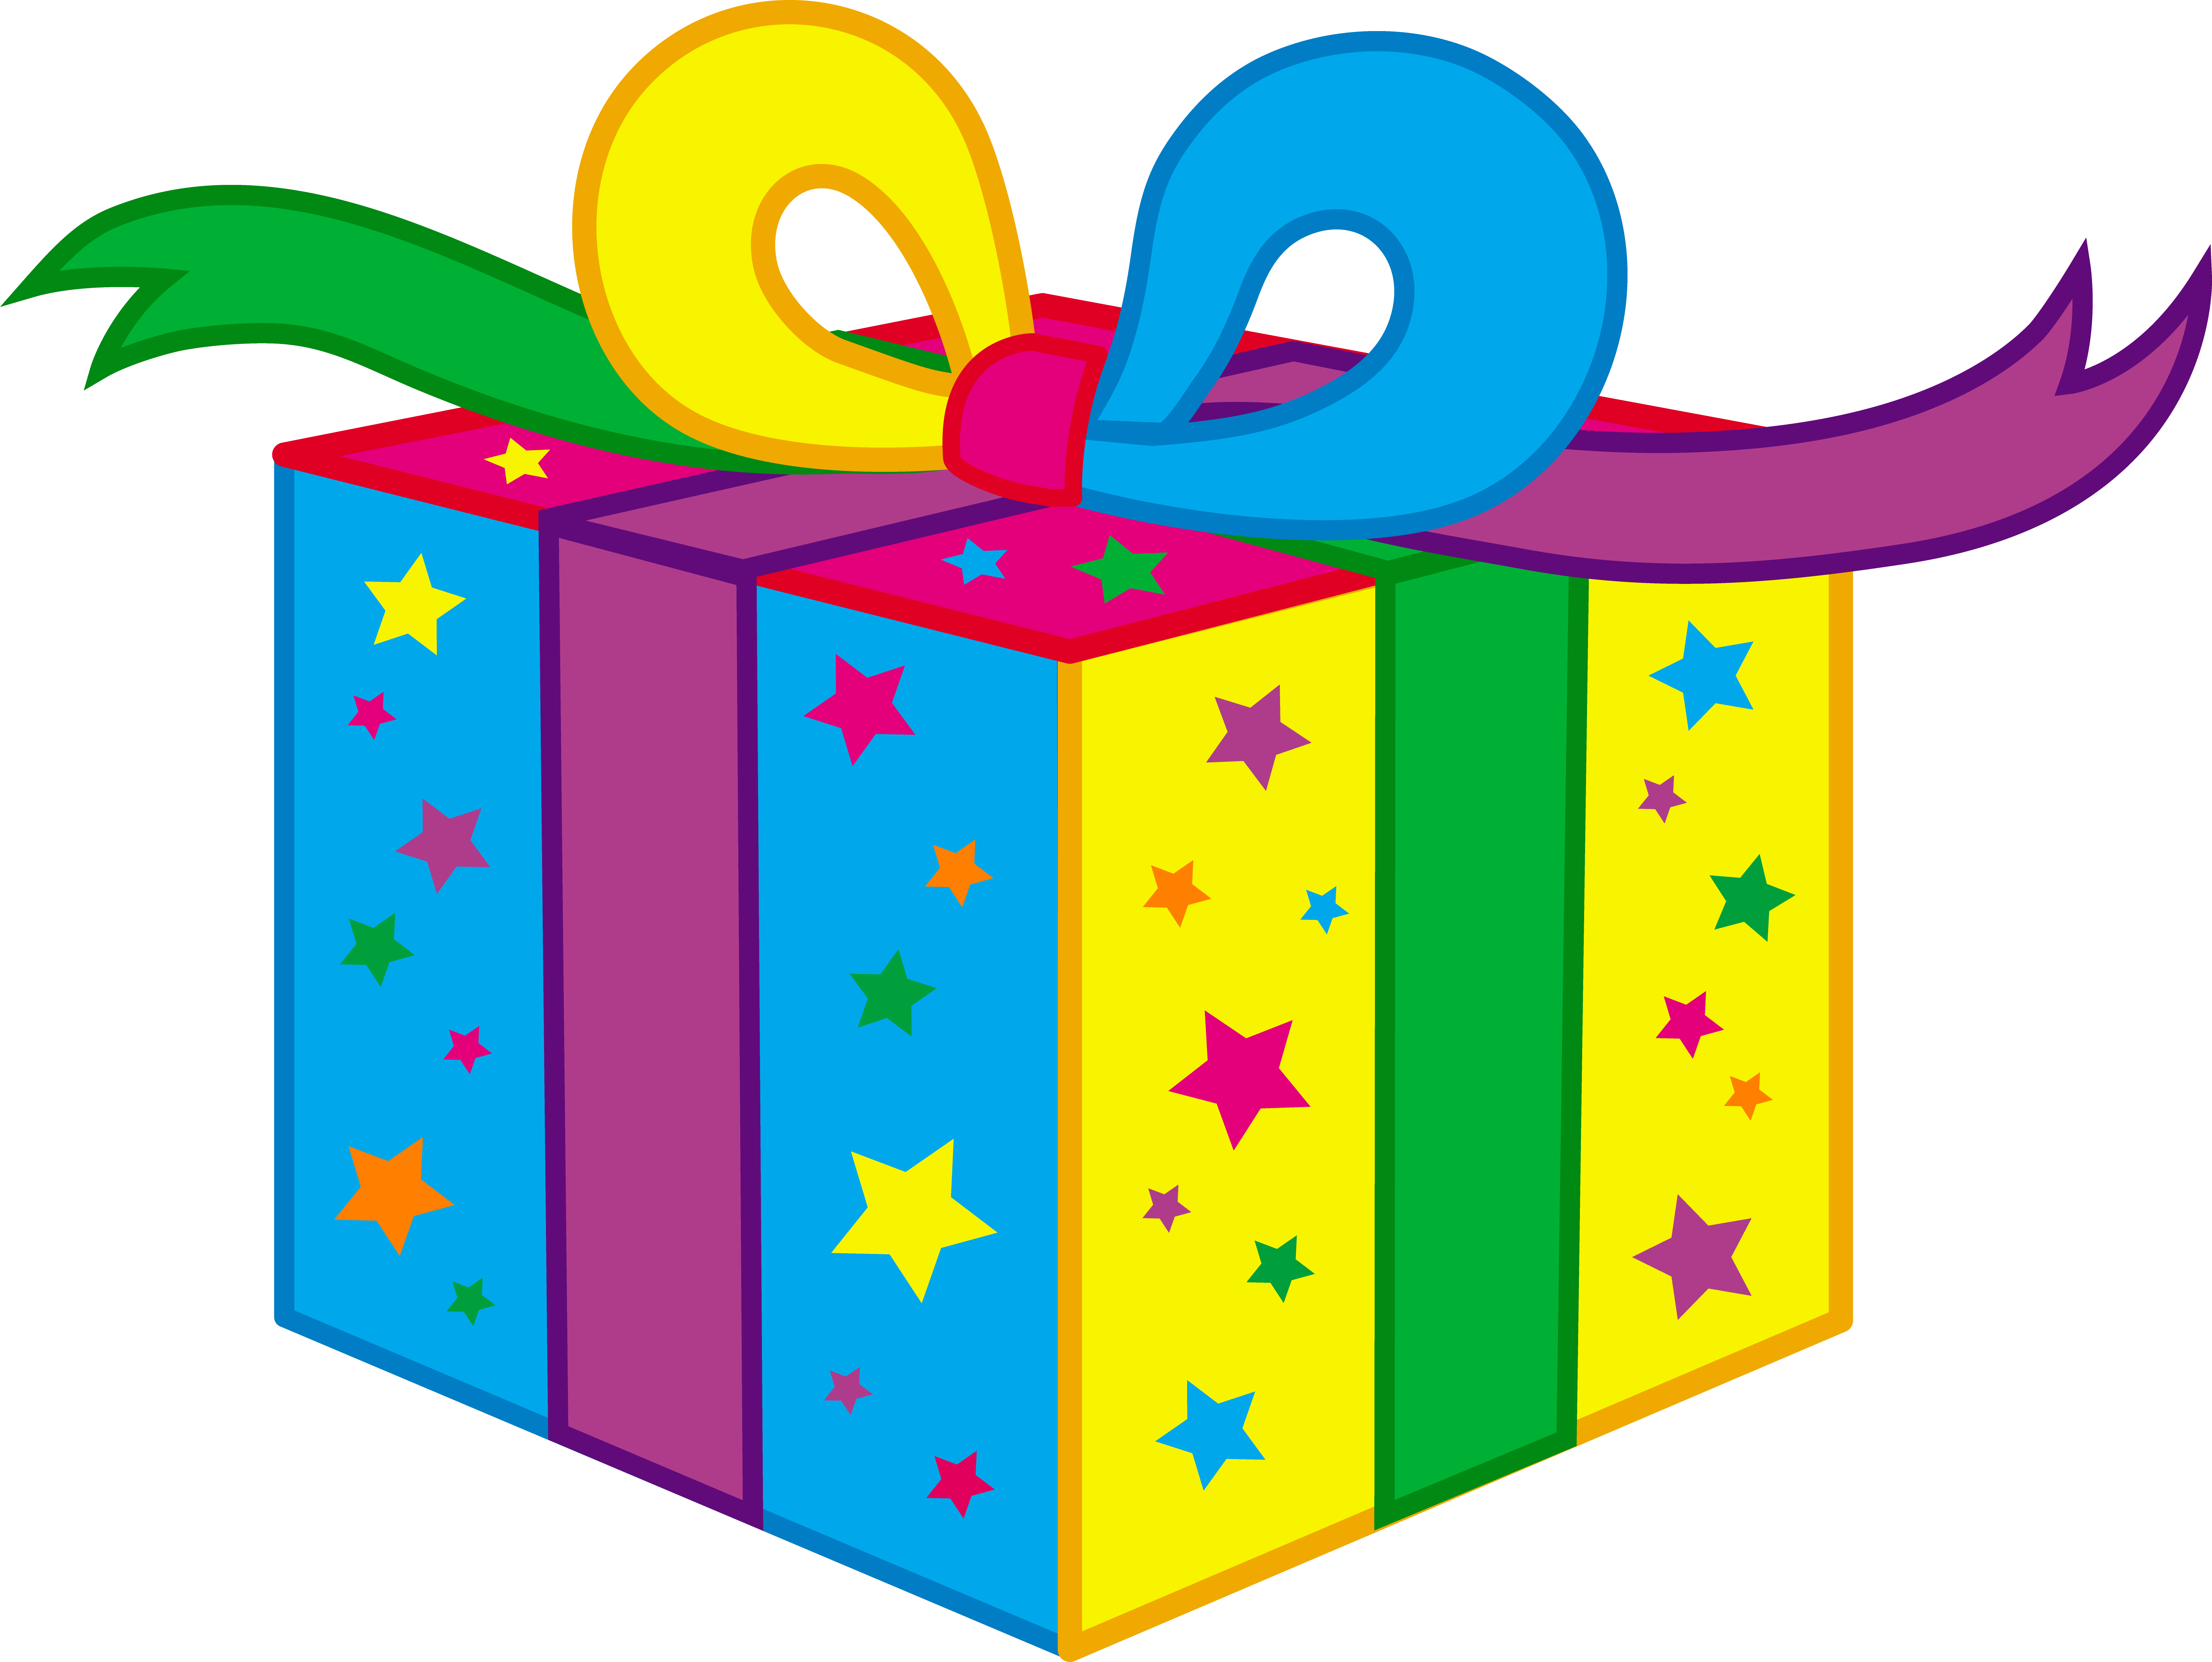 birthday clipart u0026middot; free birth-birthday clipart u0026middot; free birthday clipart-15